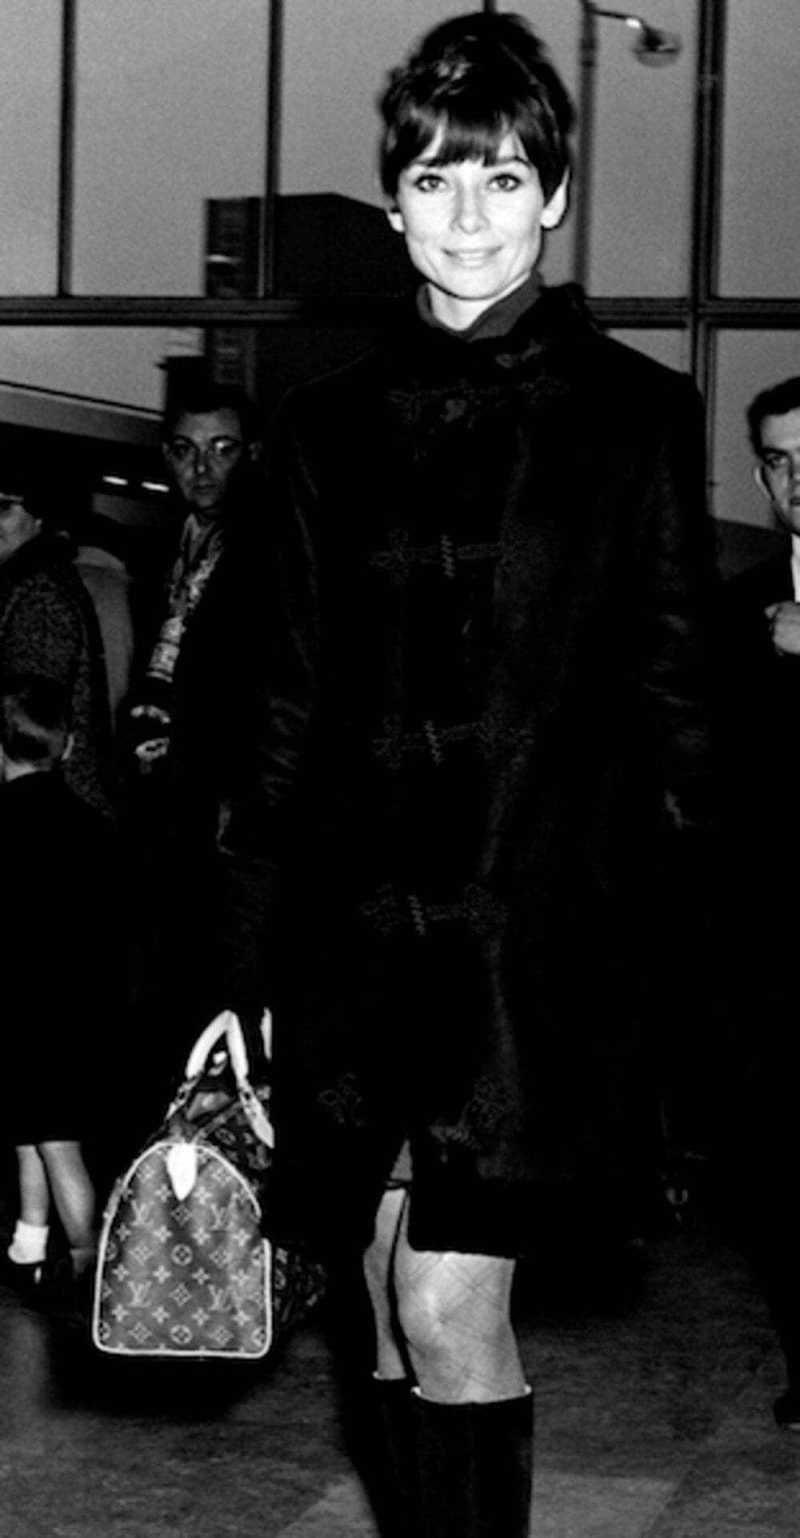 Louis Vuitton - THE luxury brand